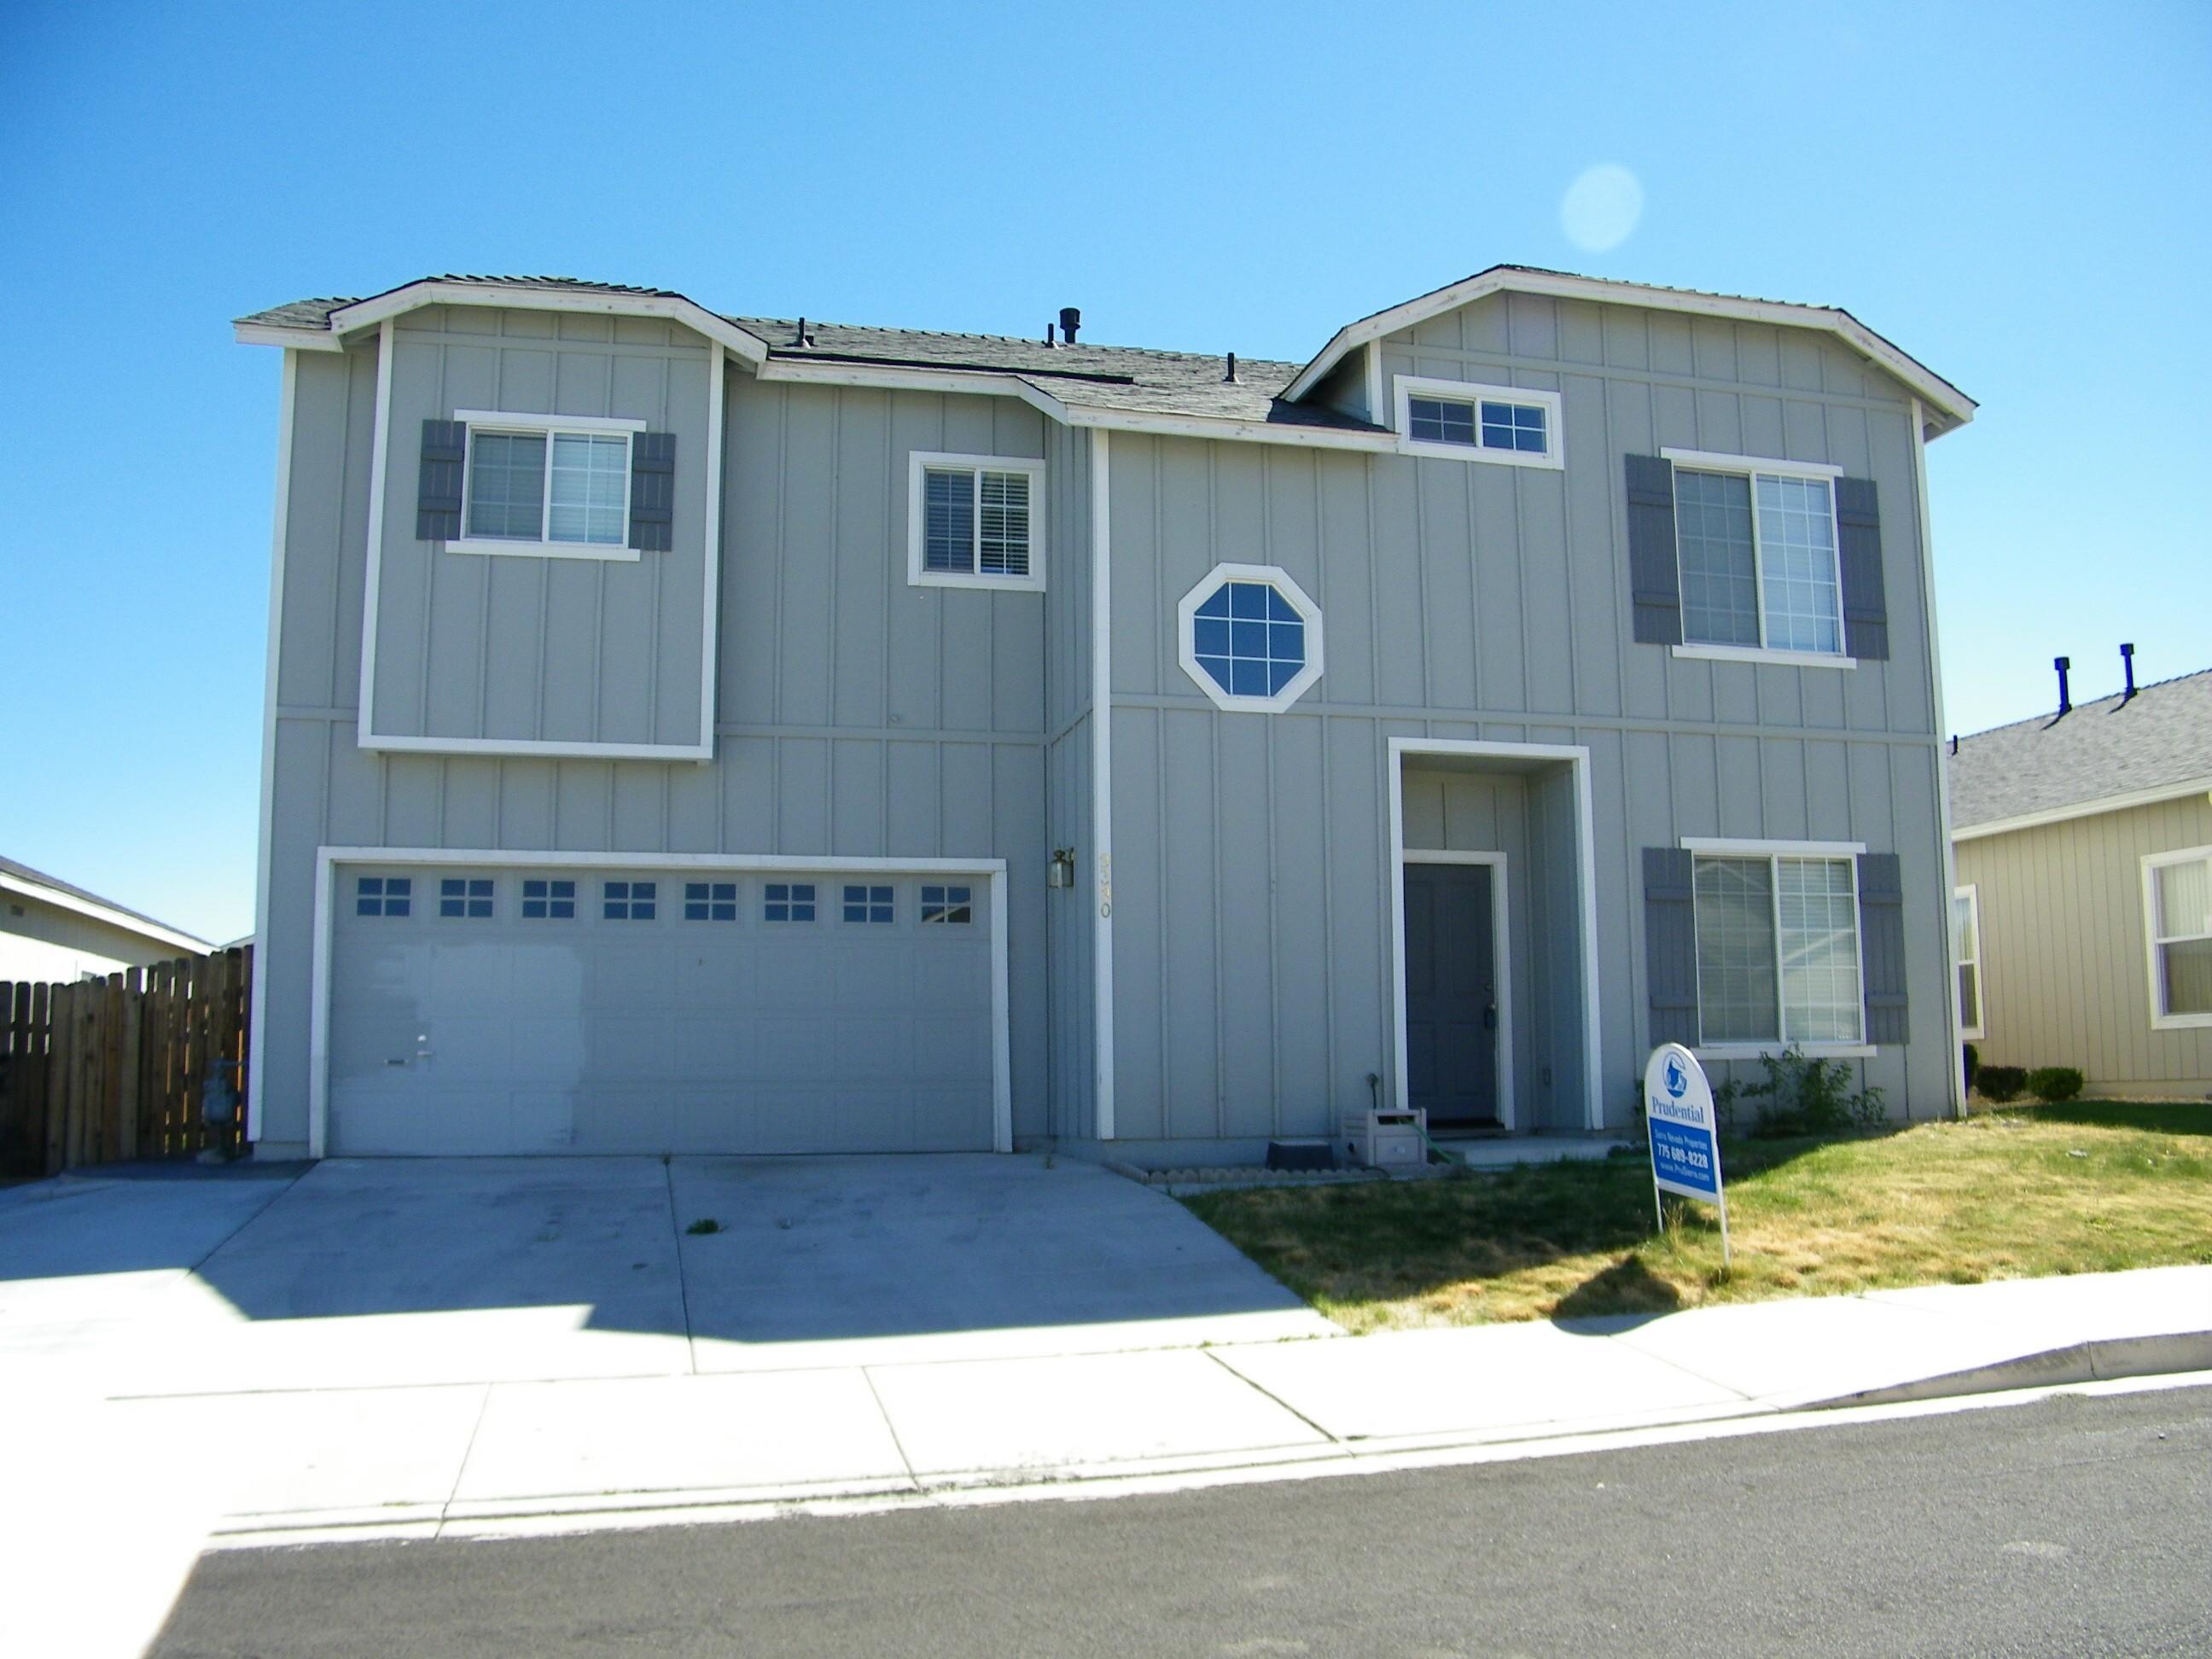 9390 stoney creek way reno nv 89506 foreclosed home